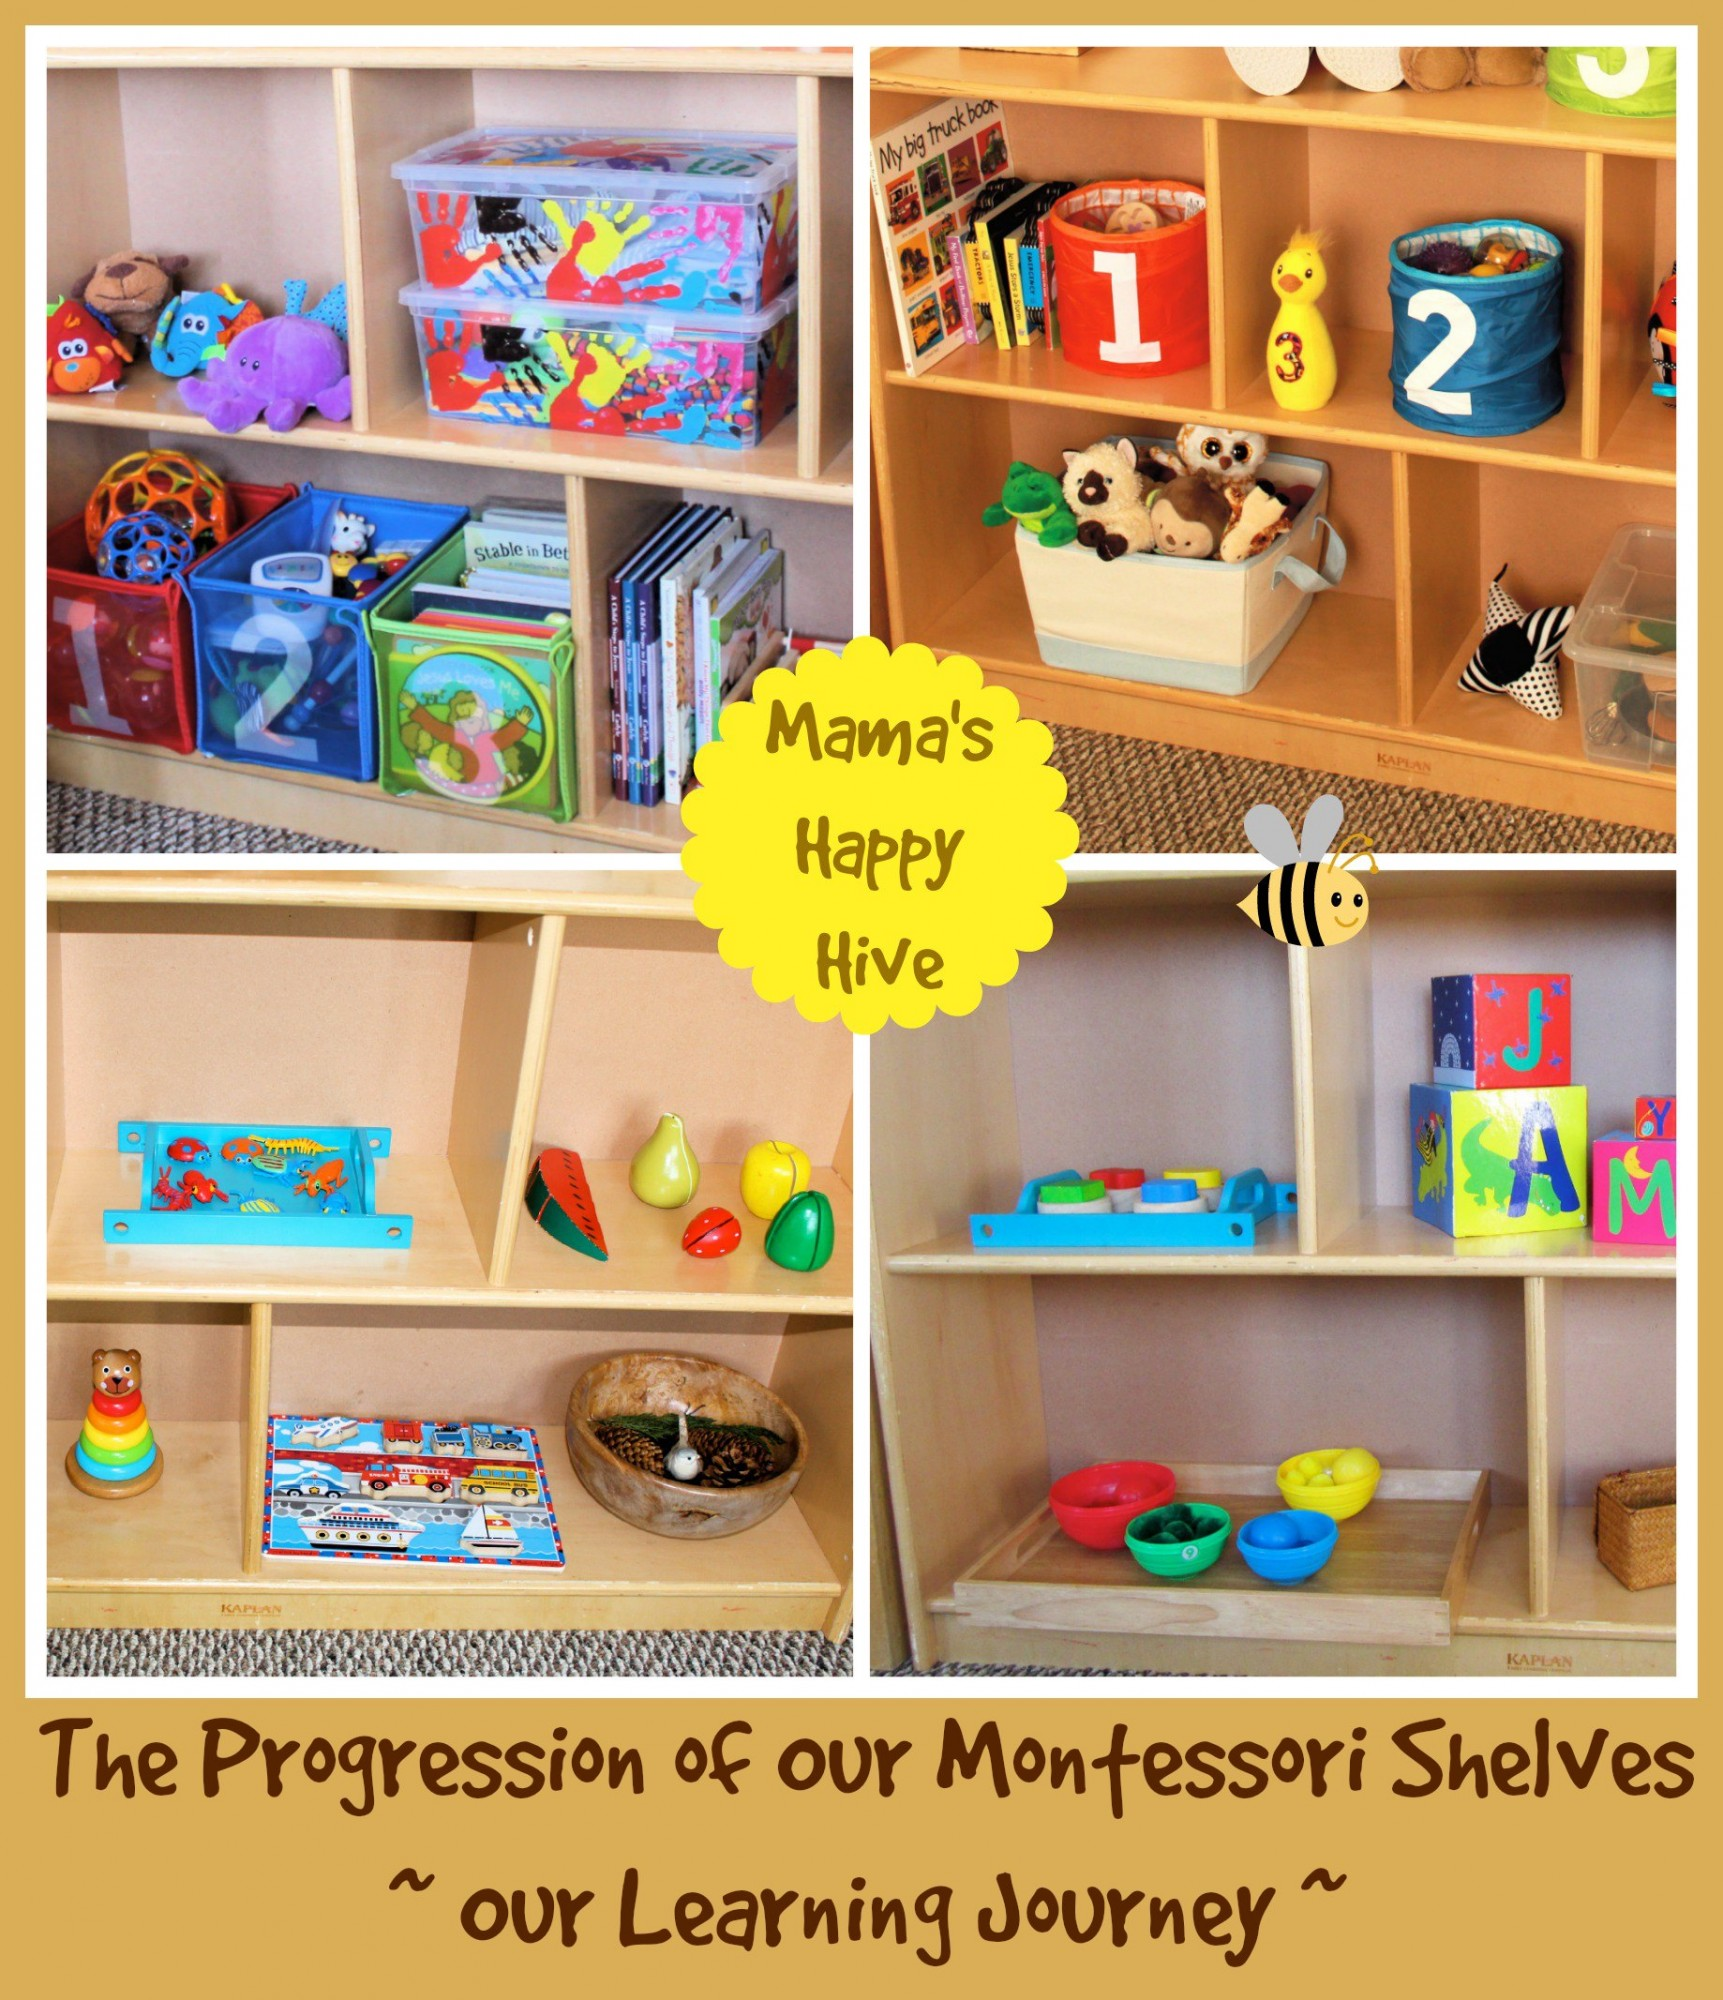 The Progression of Our Montessori Shelves